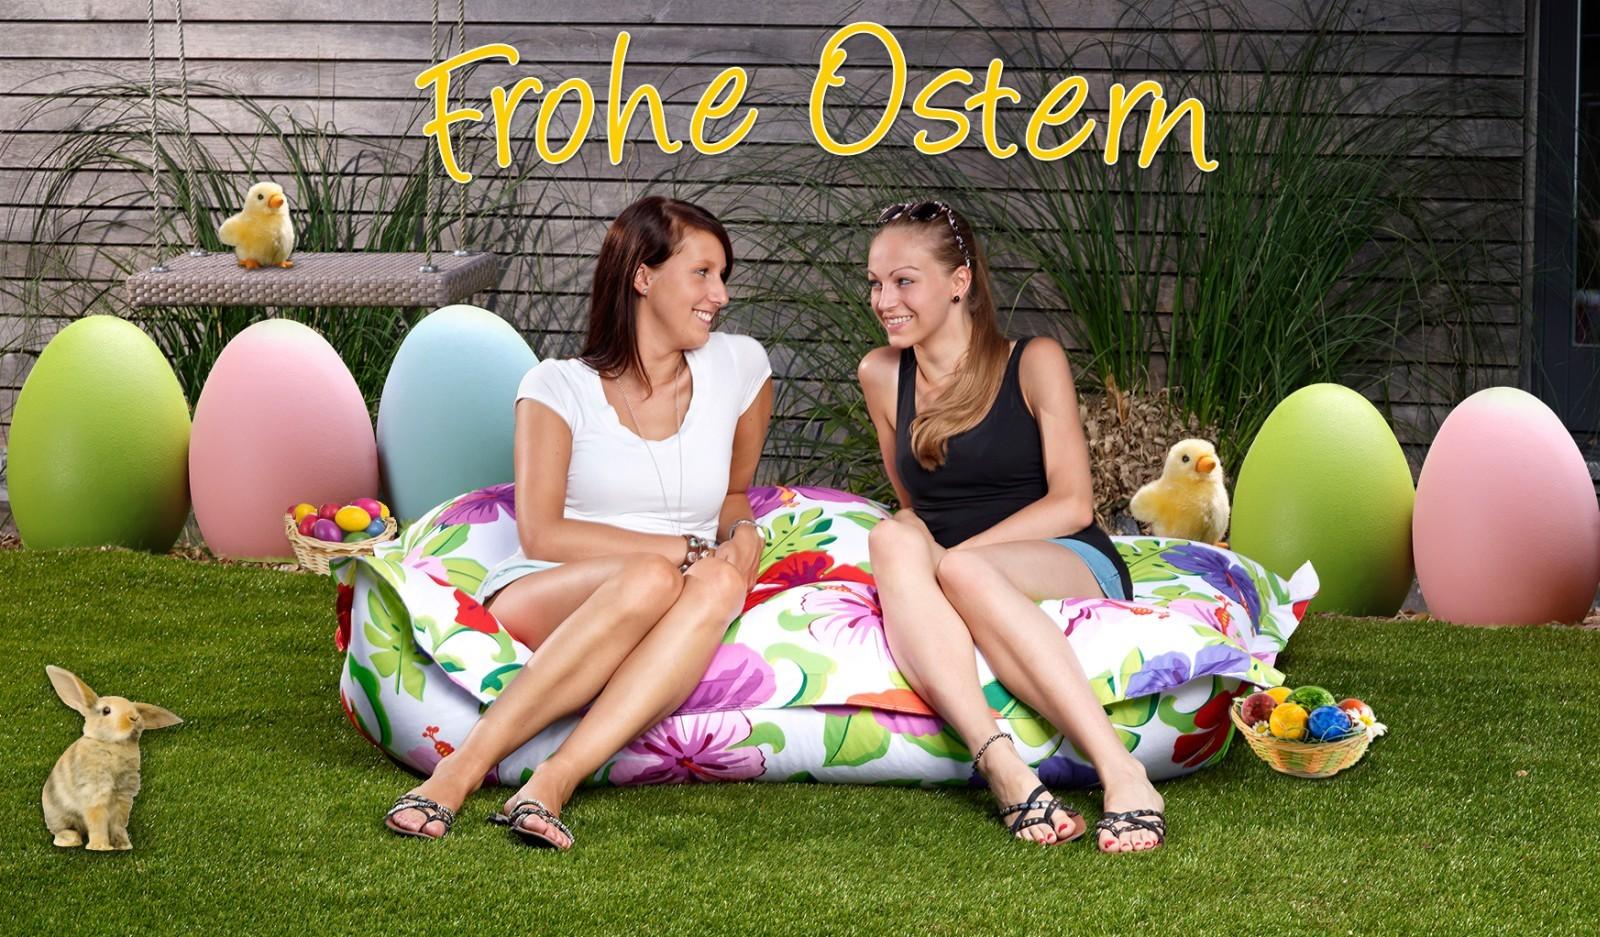 Frohe ostern auf dem rasen deluxe reinkemeier rietberg handel logistik ladenbau - Reinkemeier rietberg ...